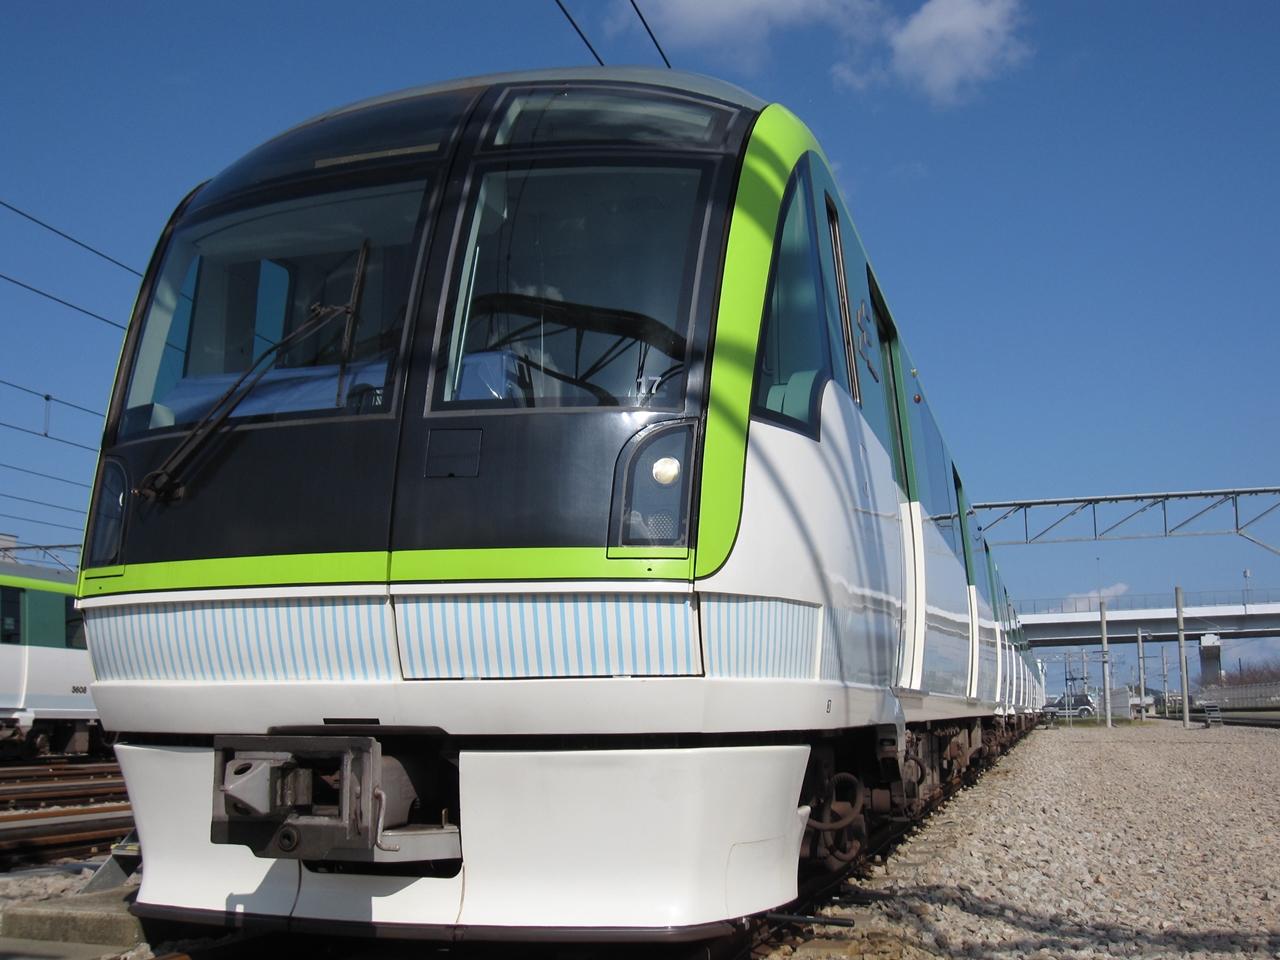 地下鉄車両(3000系)(2013)の画像